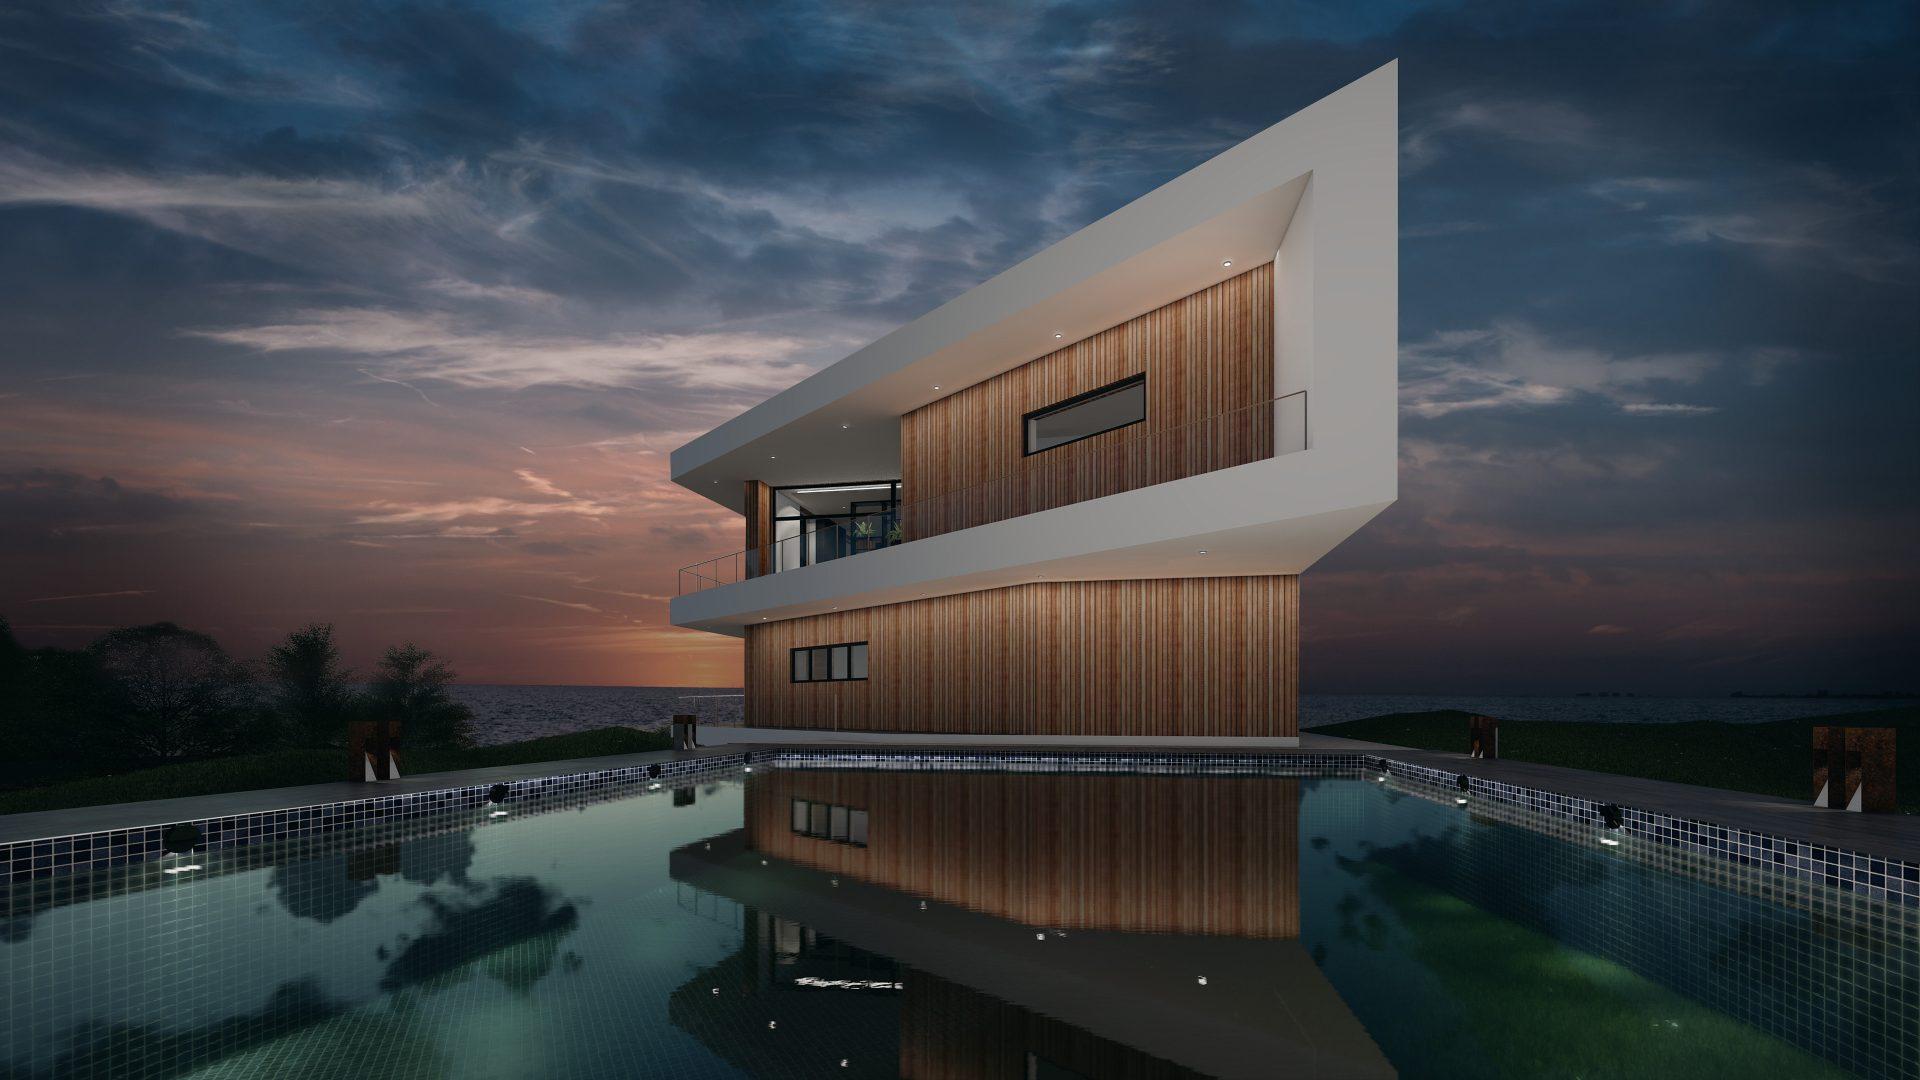 Nybyggeri Aalborg, Århus , Nordjylland, moderne funkisvilla